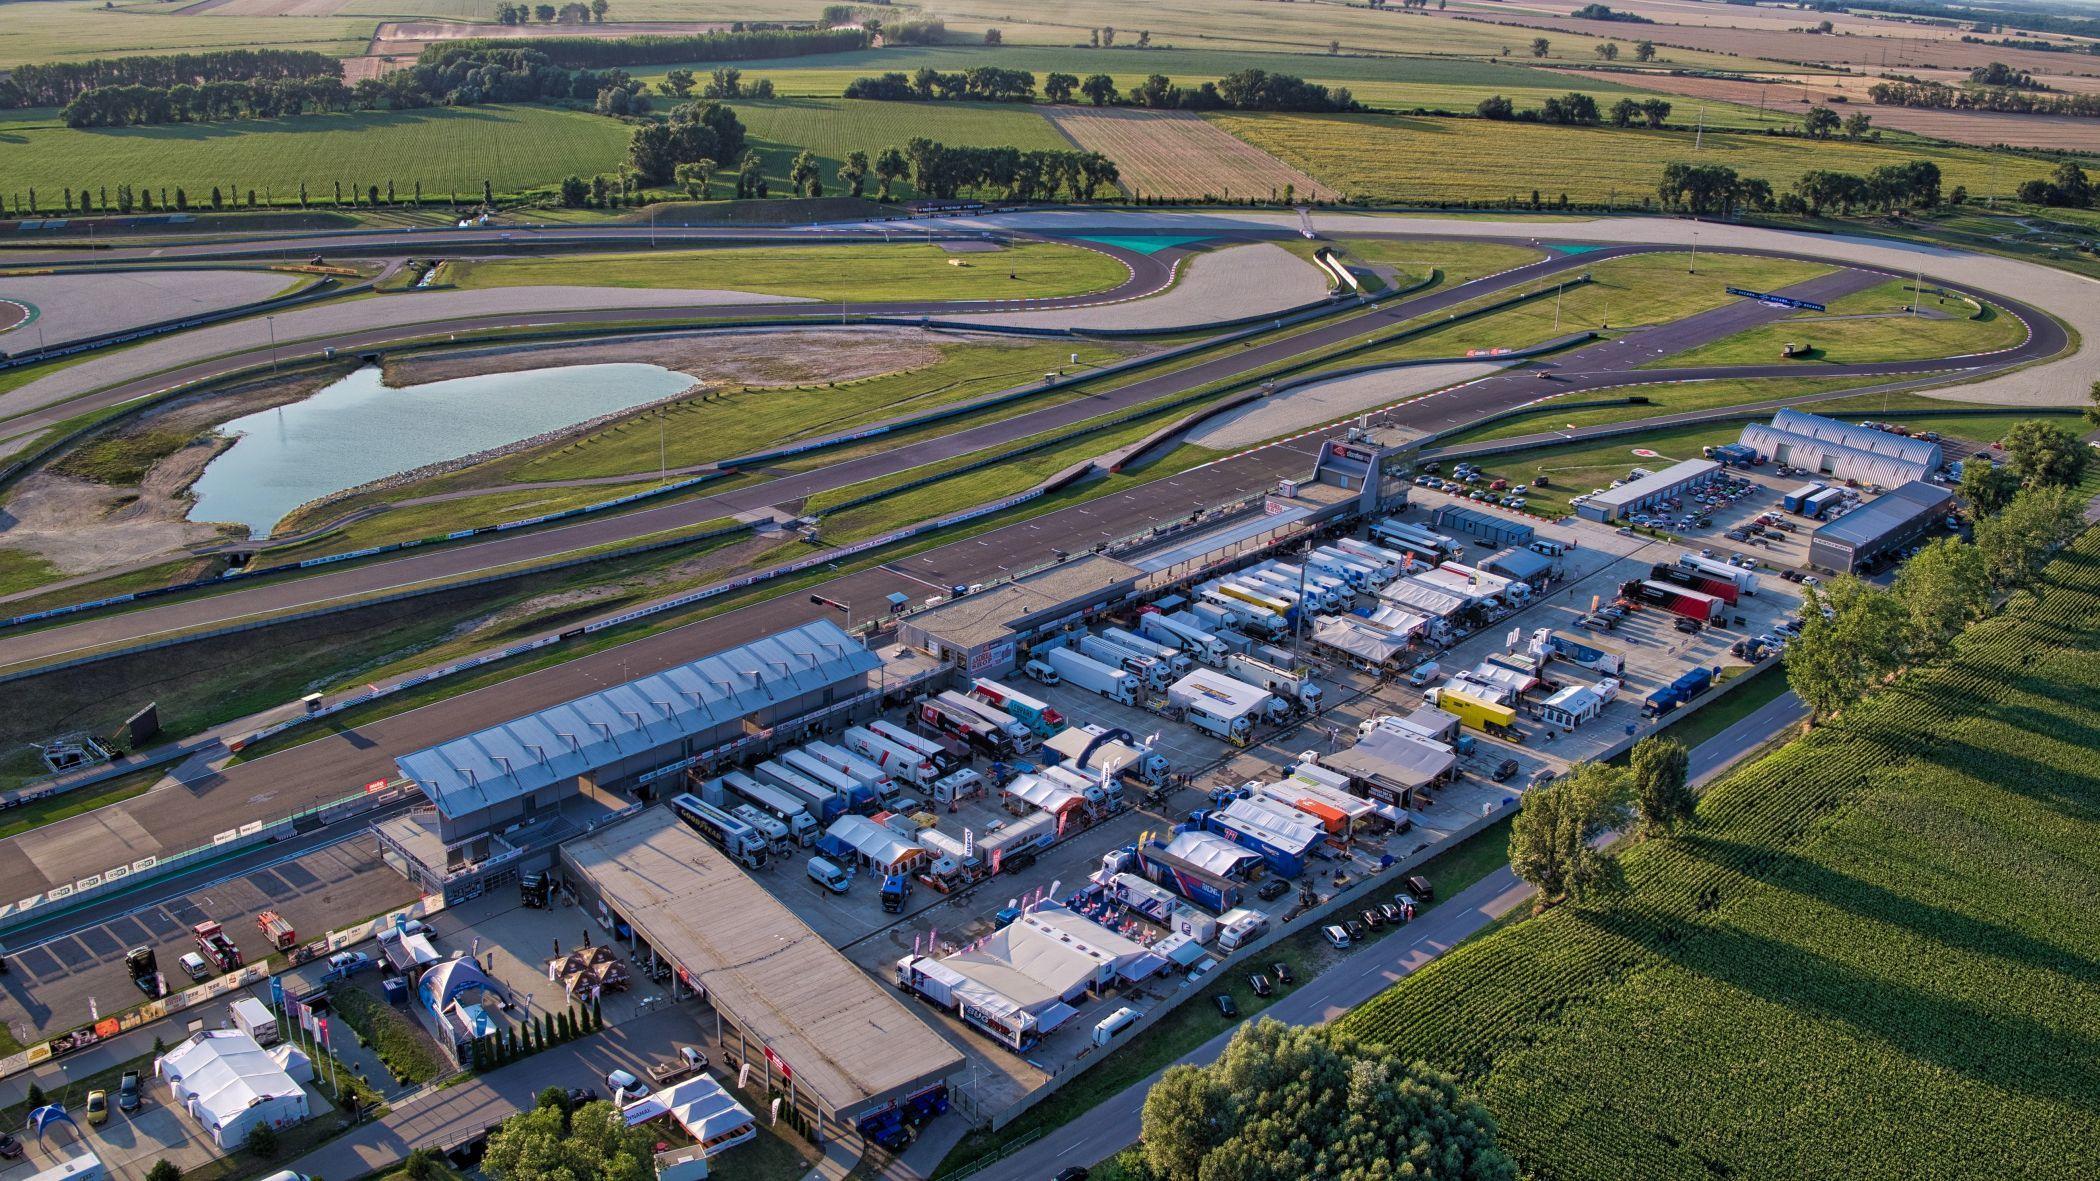 Slovakia Ring Eurosport Drone Images JULY20180044 9